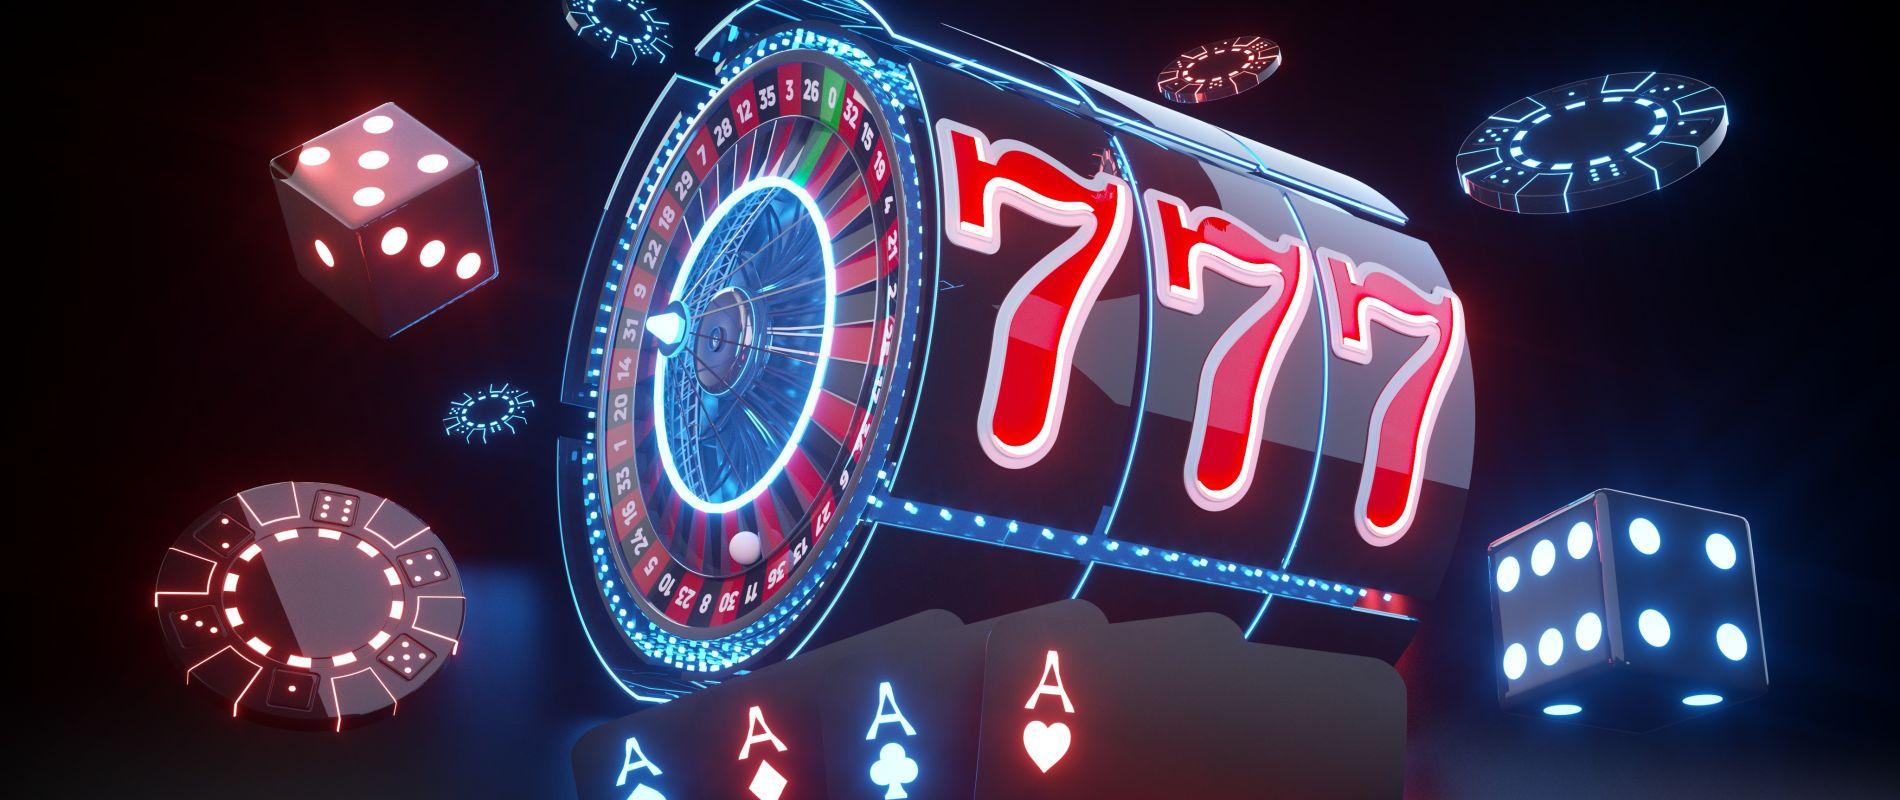 Salony gier na automatach